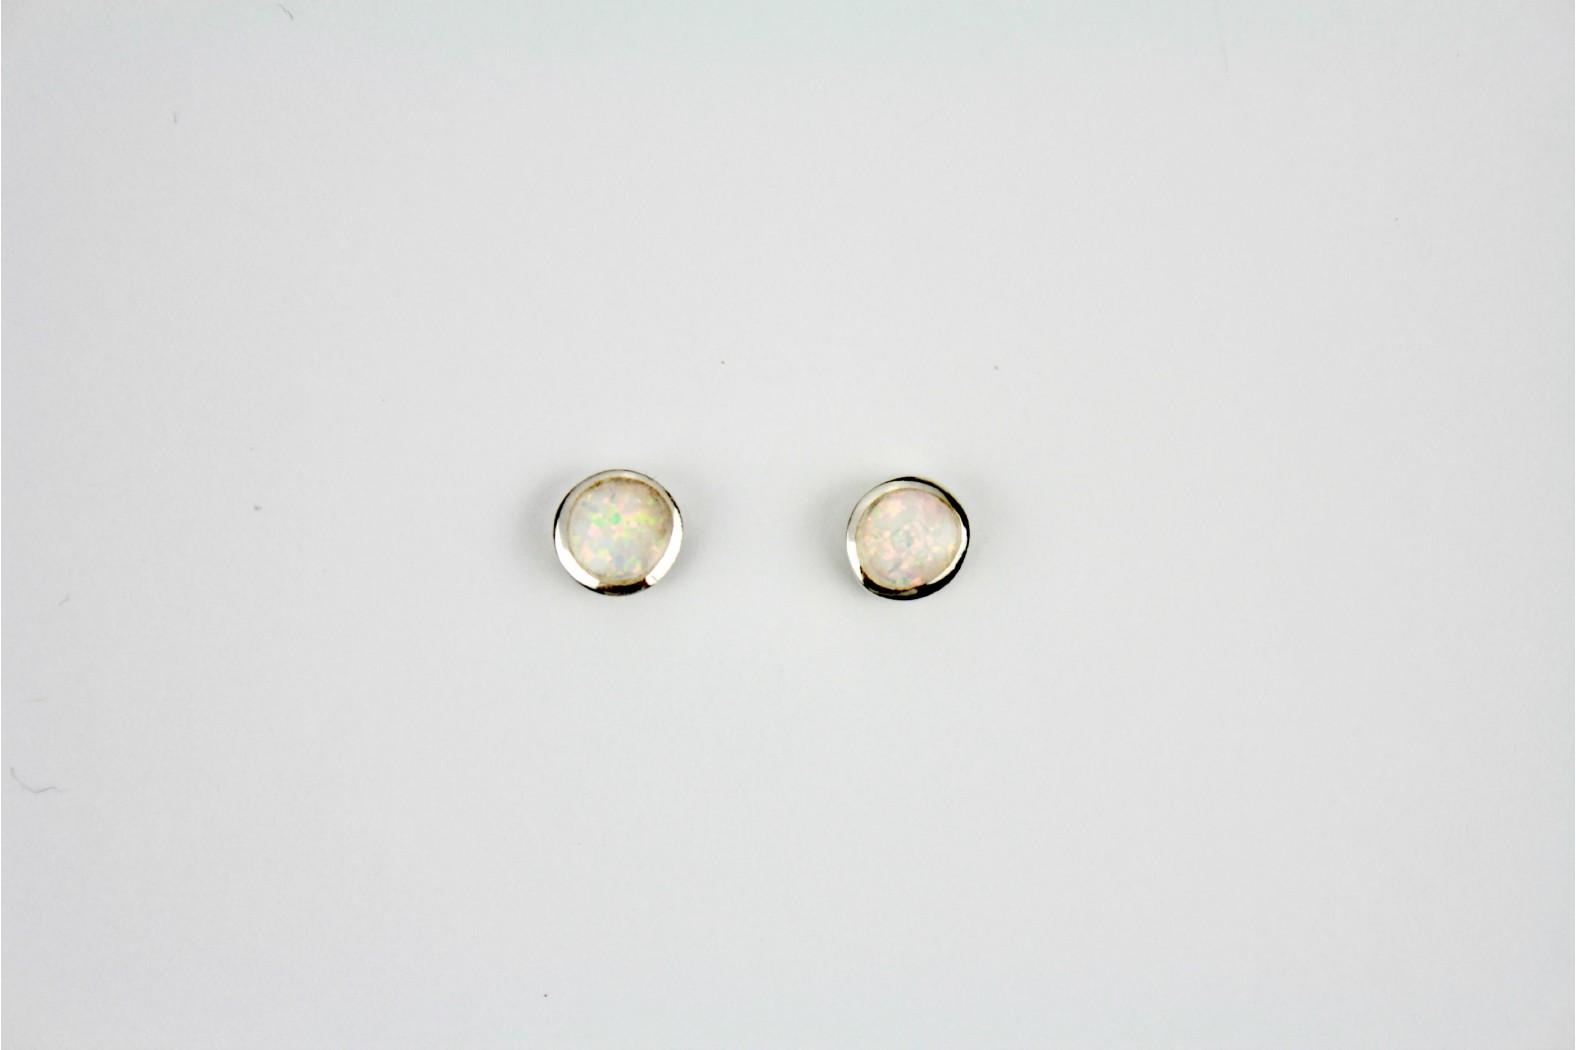 White Opal Fire circular silver edge created stud earrings